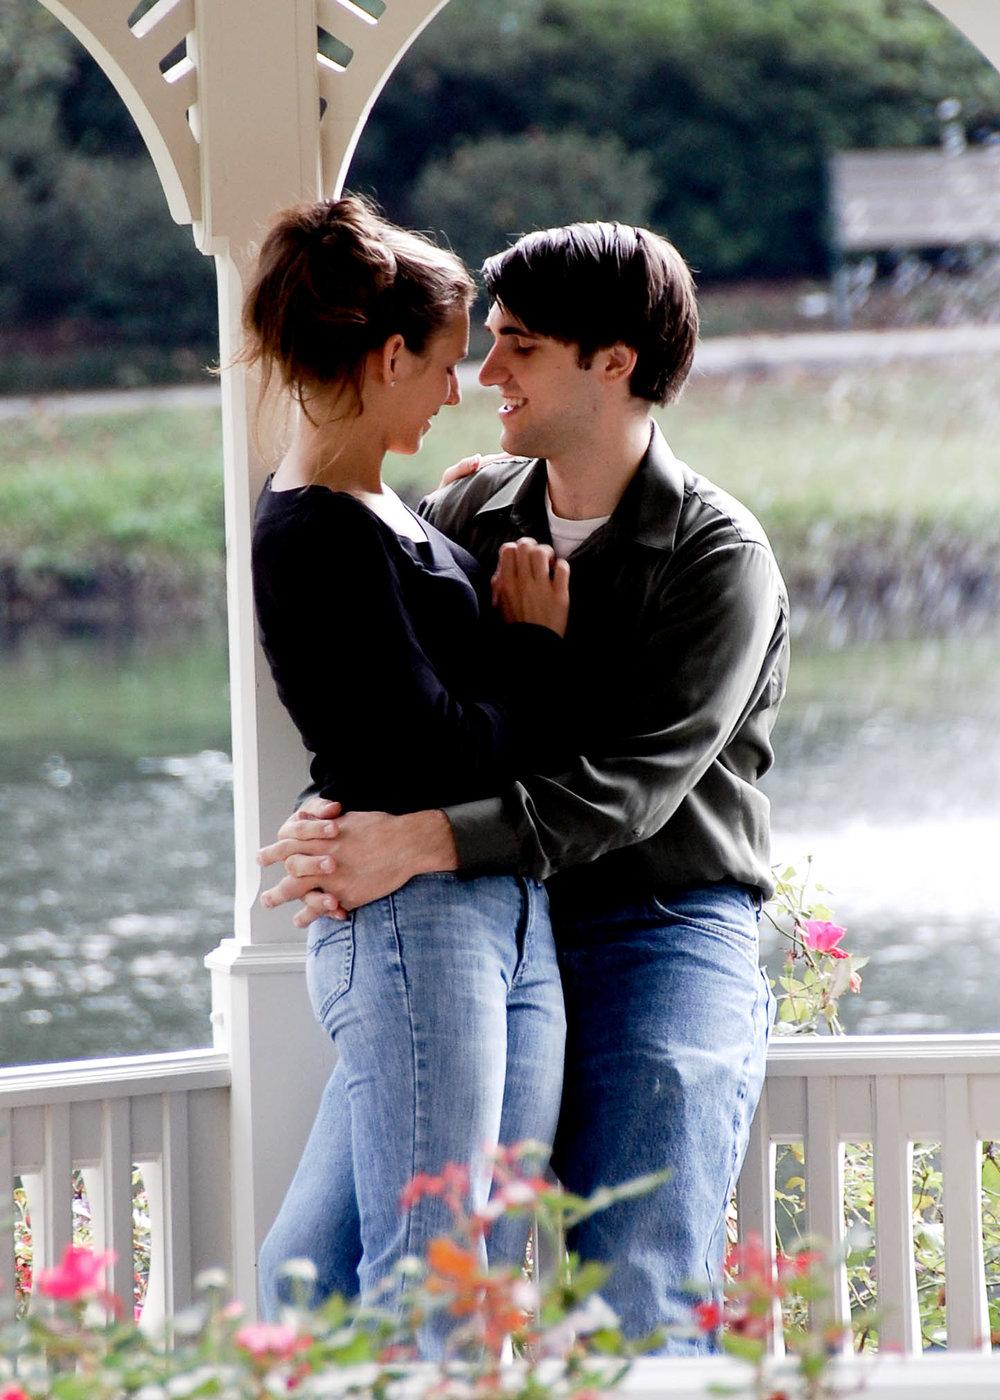 Engagement portrait in Hugh McRae Park in Wilmington, NC.